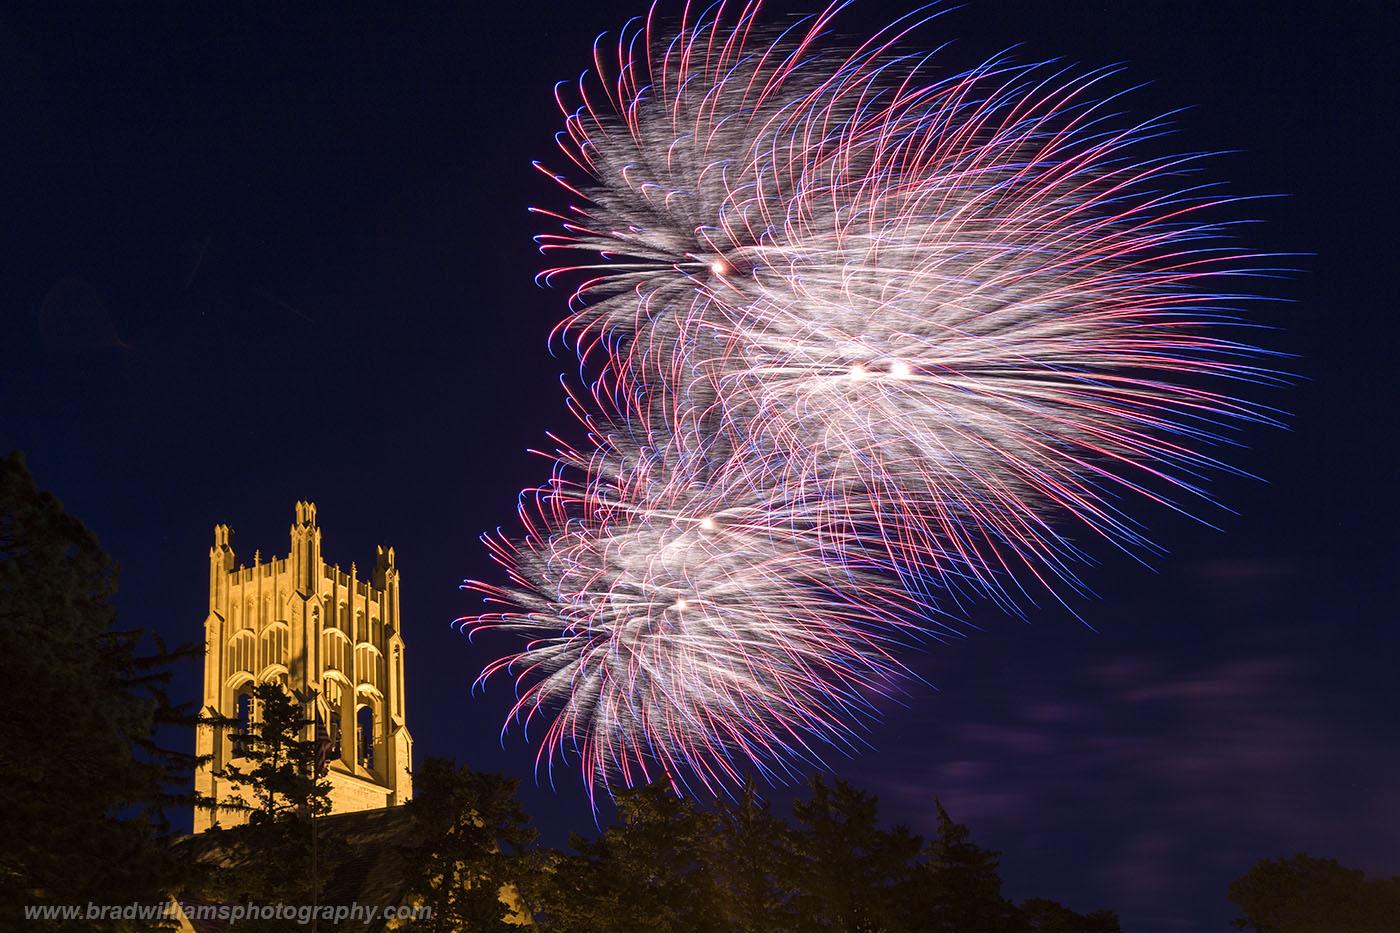 The 2013 Memorial Park Fireworks in Omaha, Nebraska